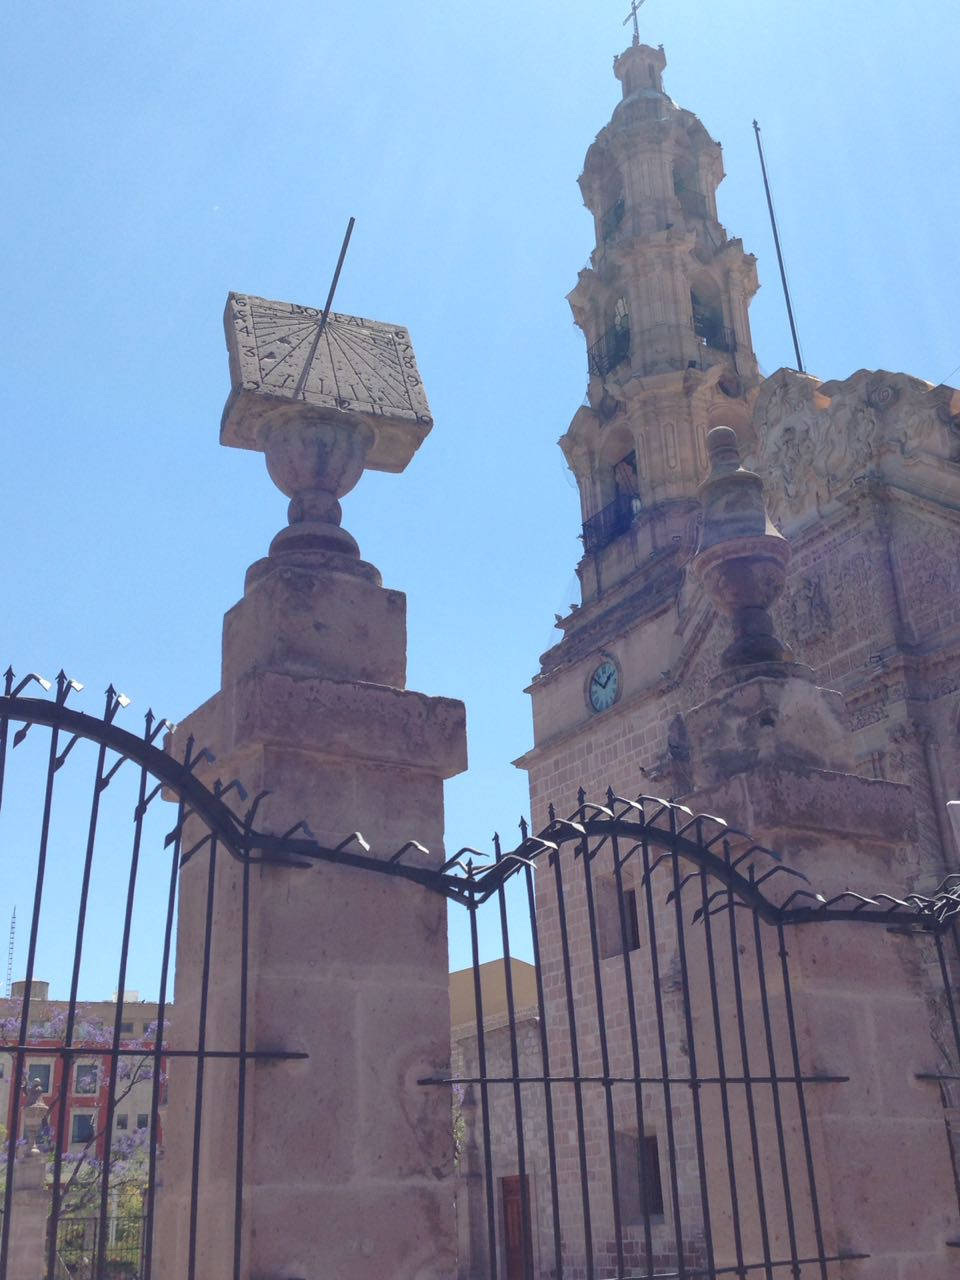 Sol El De La Catedral AguascalientesCenturia Noticias Reloj cK1lTF3J